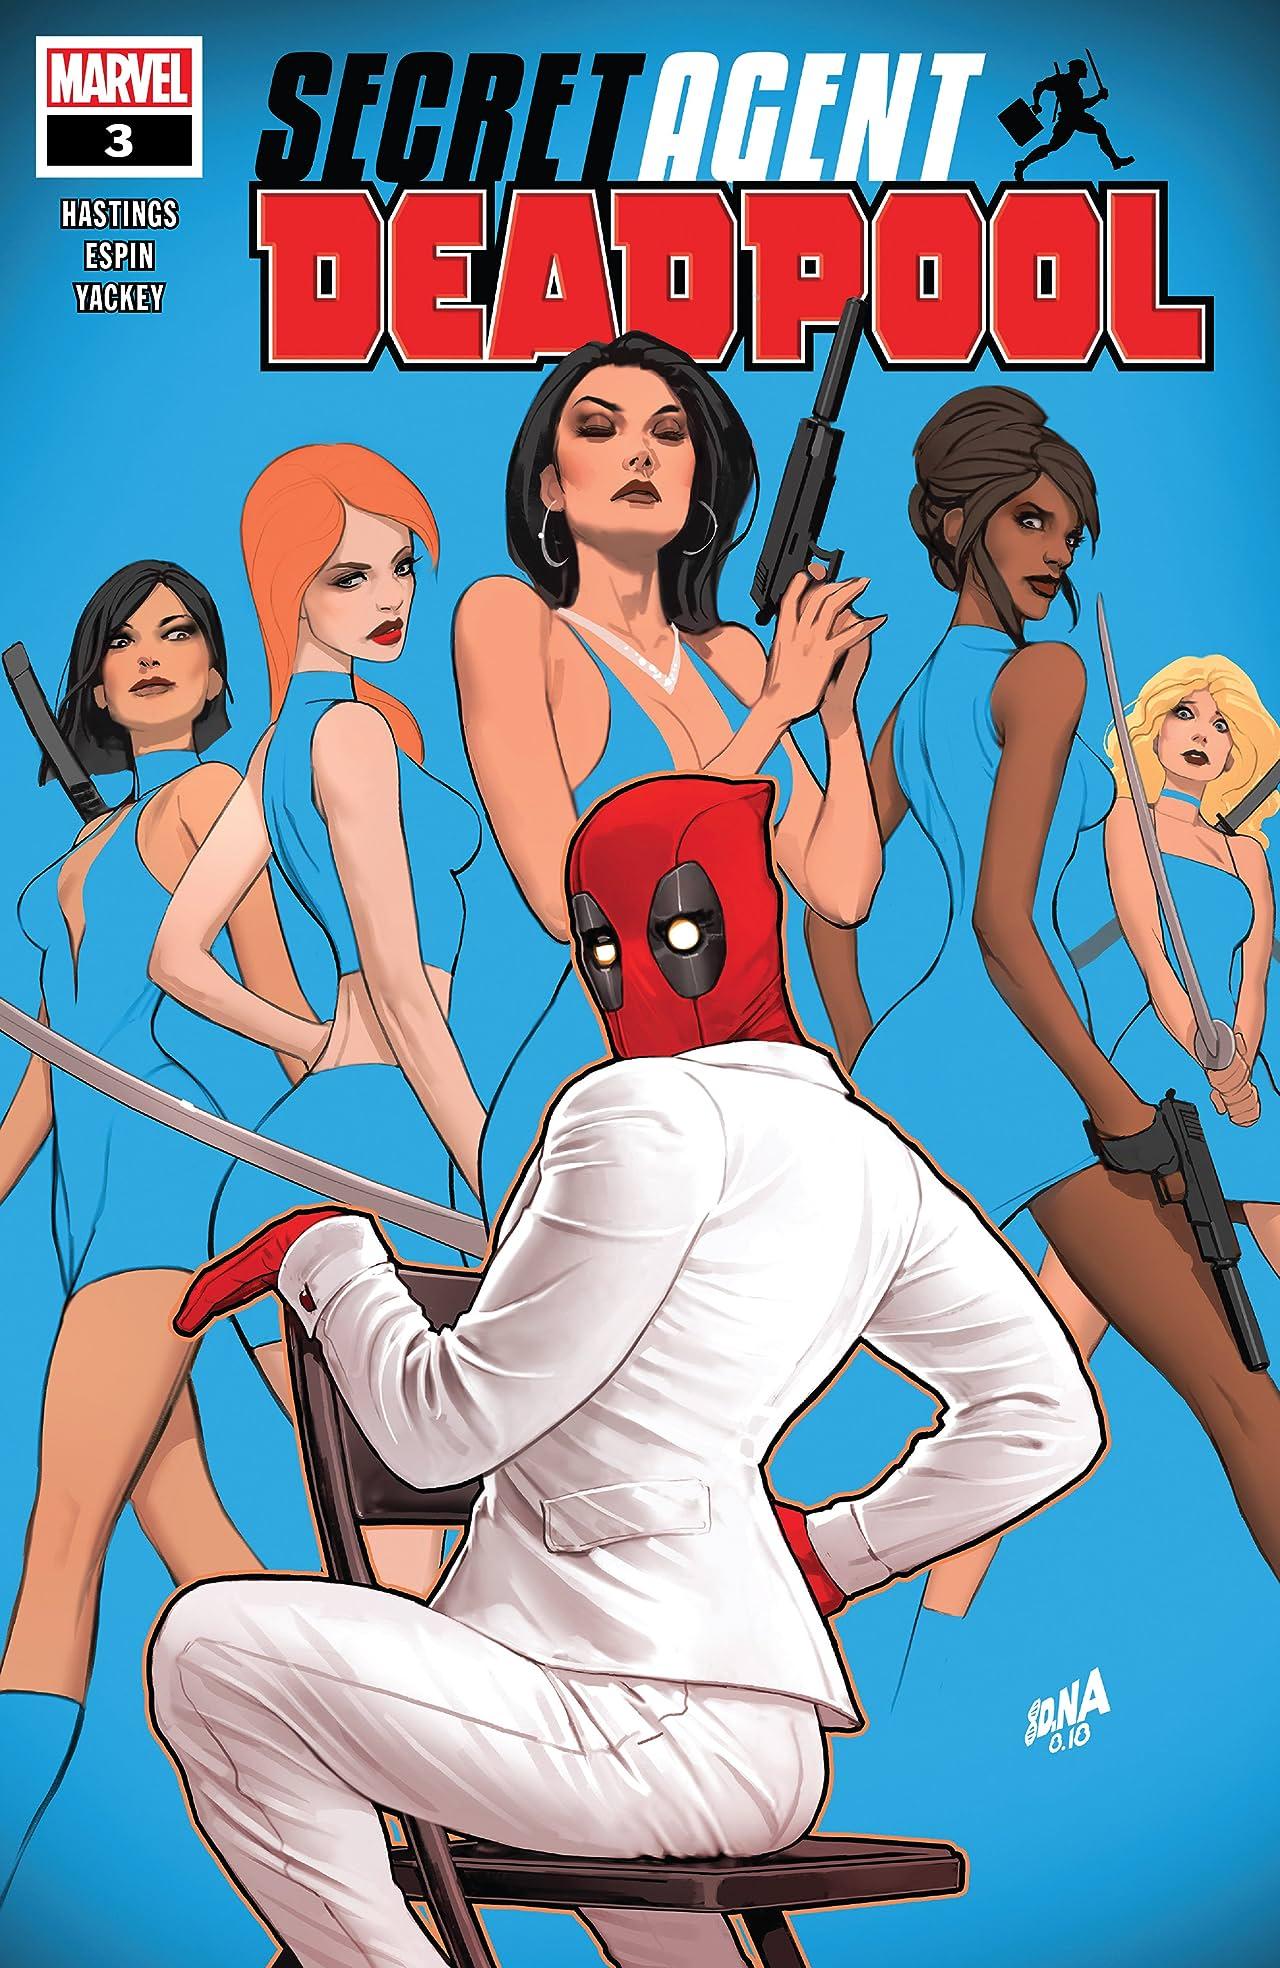 Deadpool: Secret Agent Deadpool (2018) (comiXology Originals) #3 (of 6)